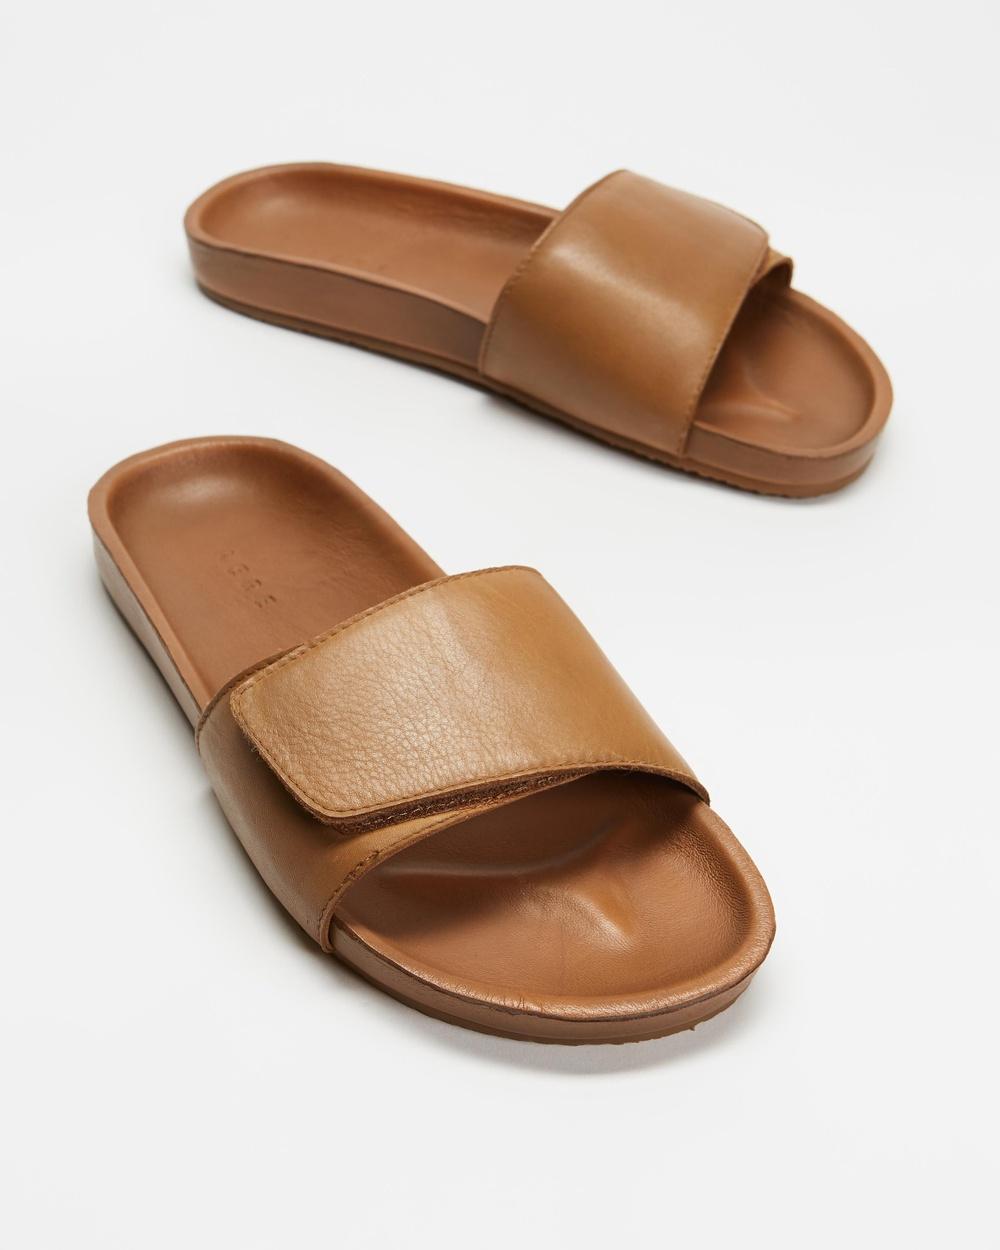 AERE Tenere Leather Slides Sandals Tan